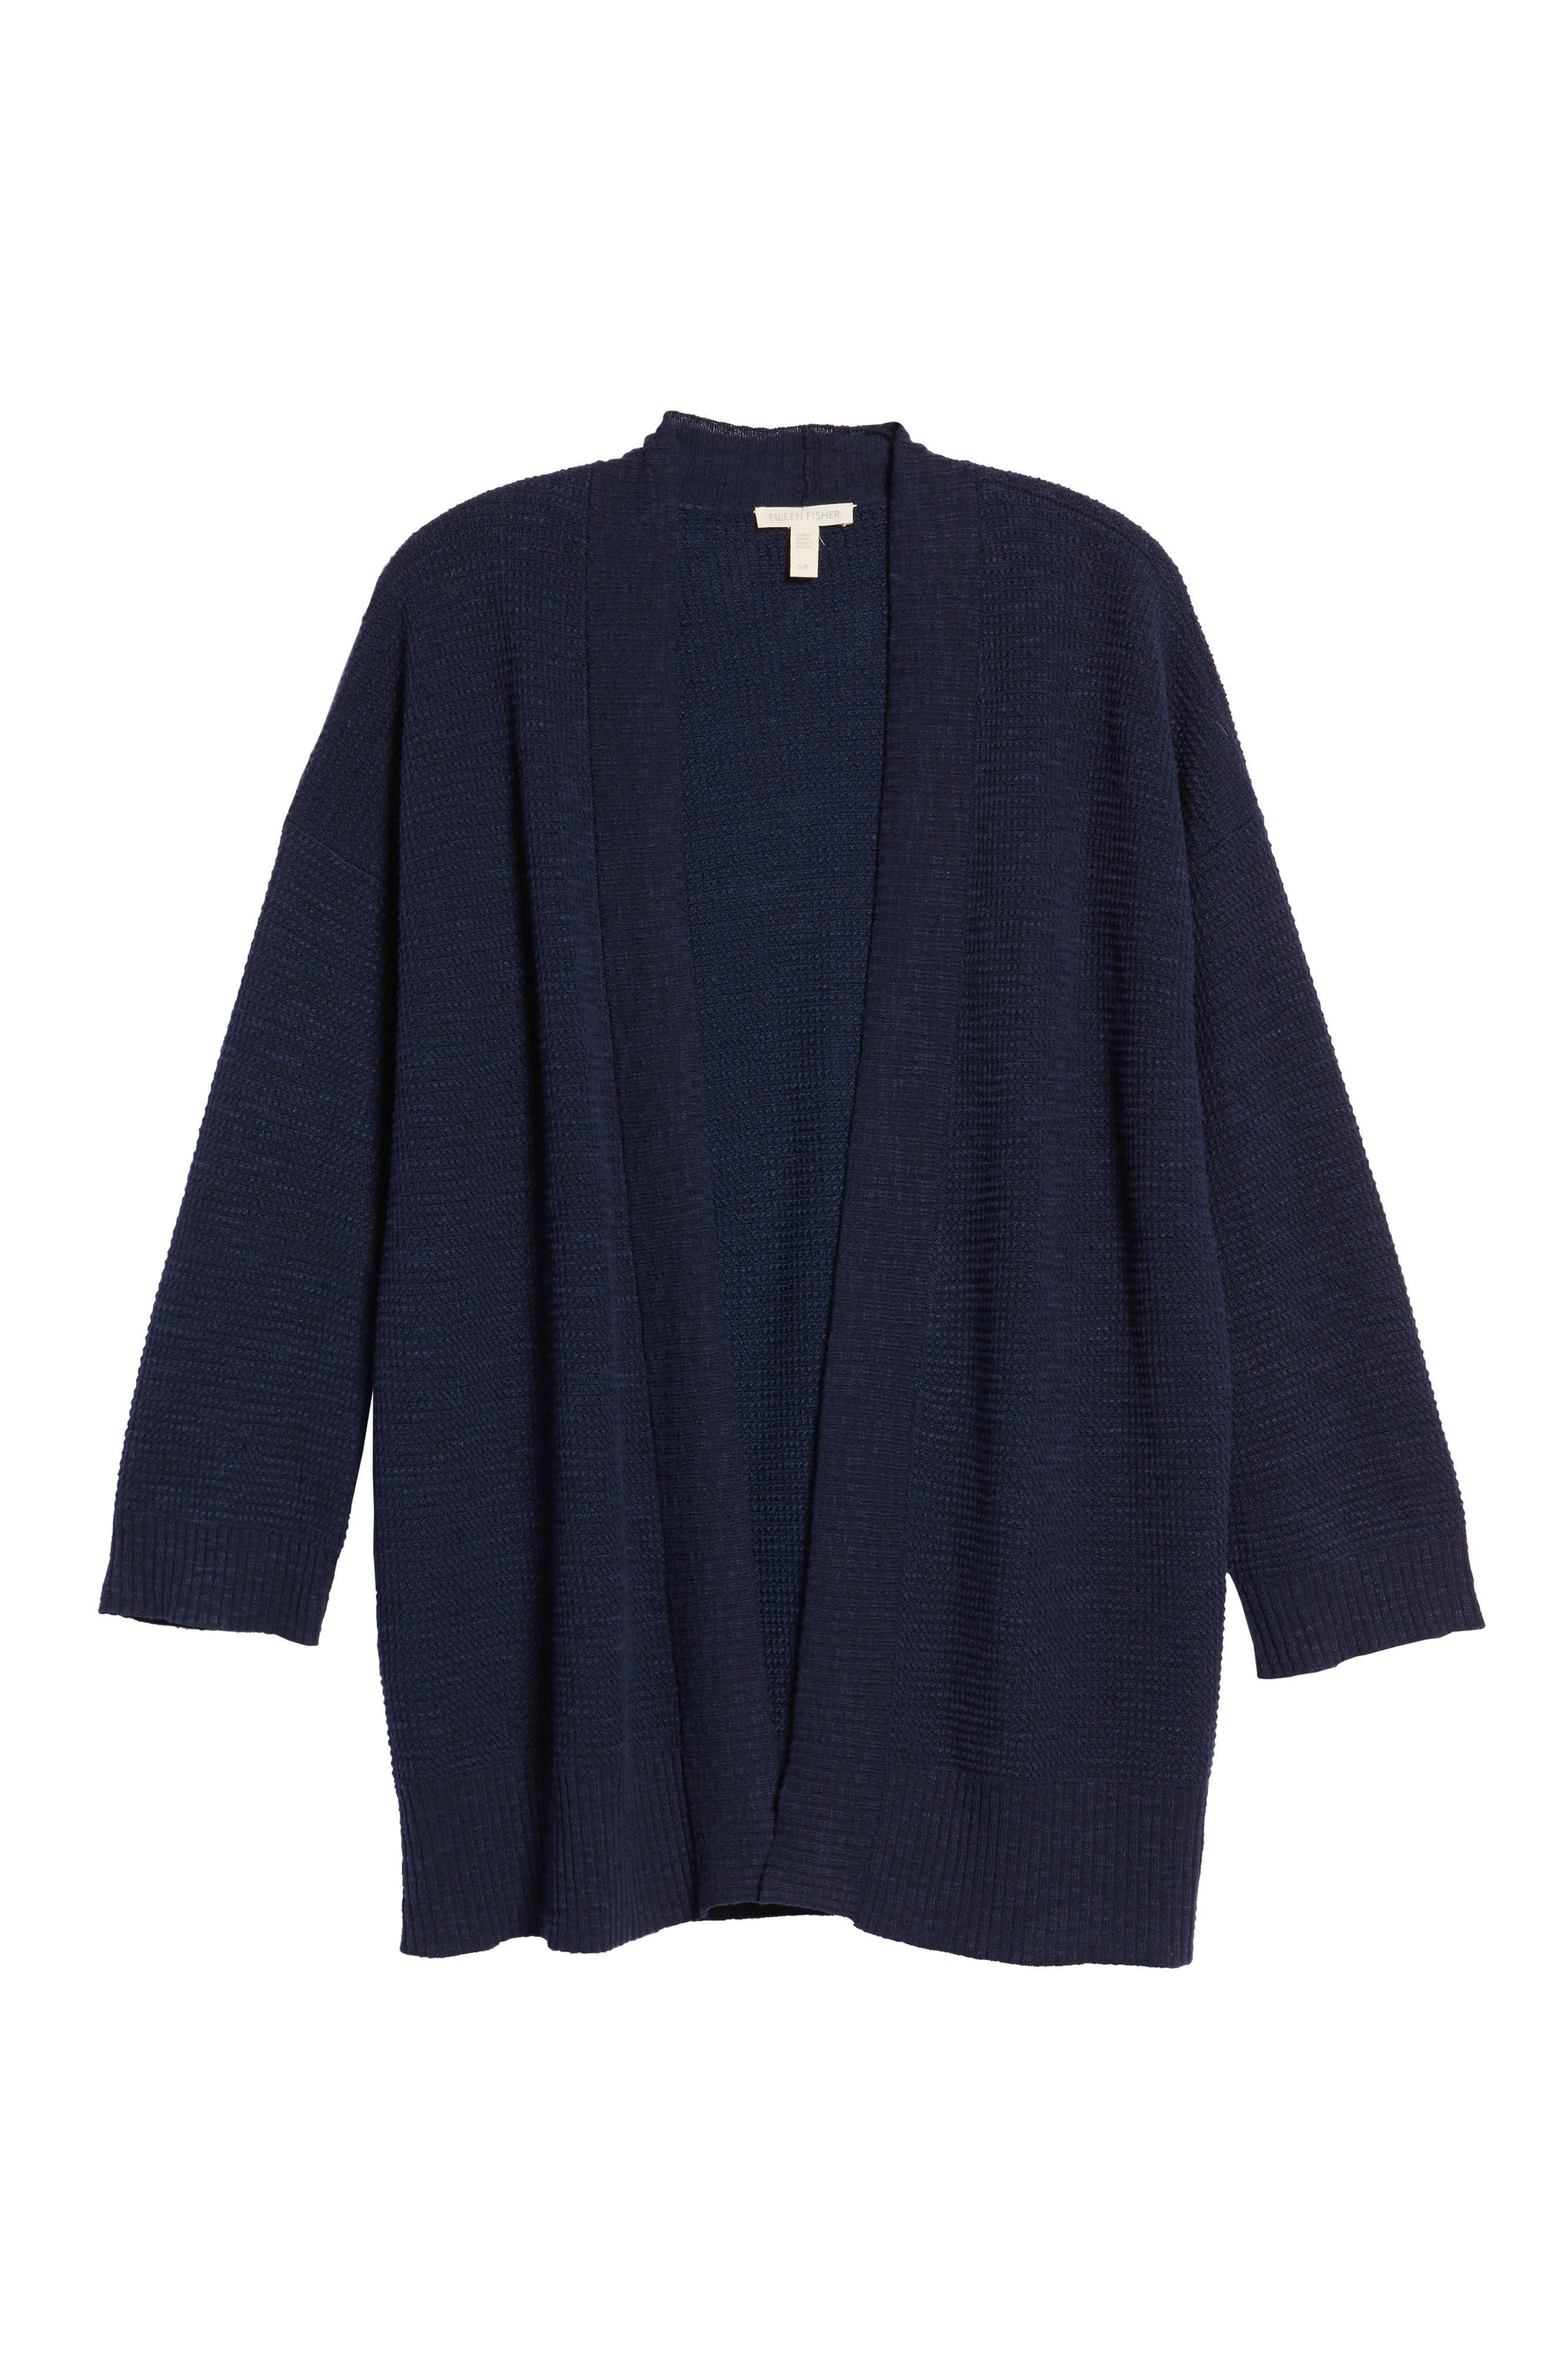 Organic Linen & Cotton Cardigan,                             Alternate thumbnail 12, color,